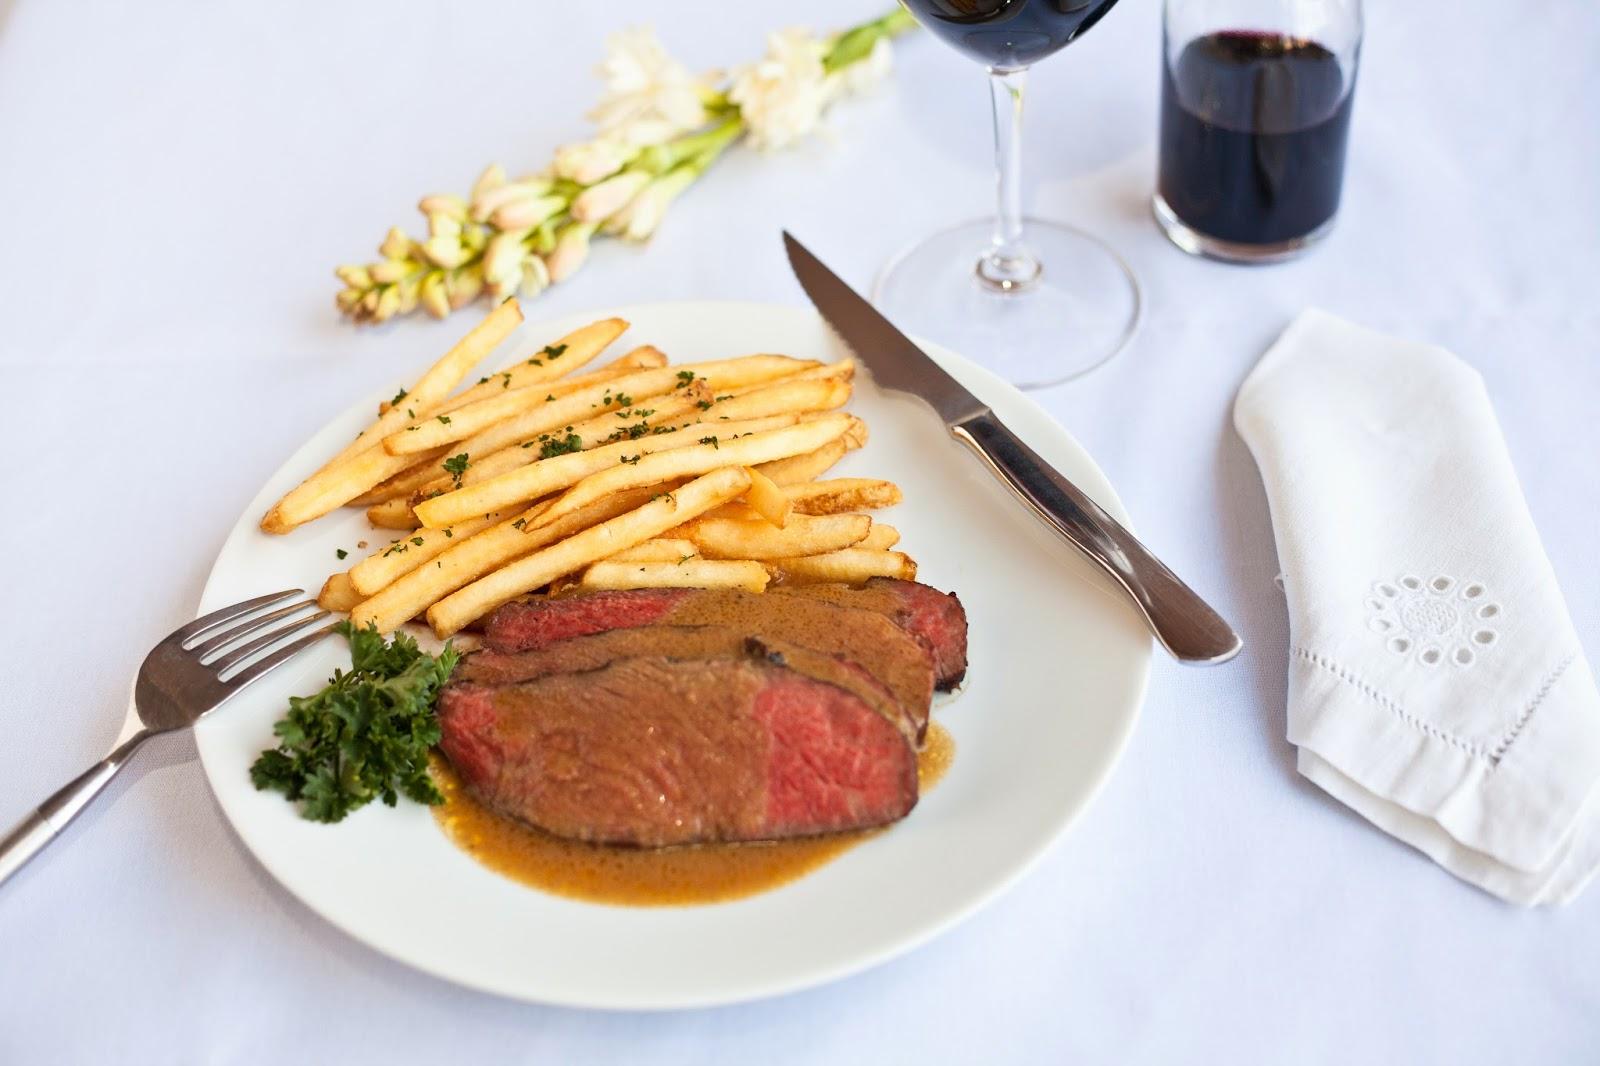 the unemployed eater l 39 assiette to serve steak frites. Black Bedroom Furniture Sets. Home Design Ideas